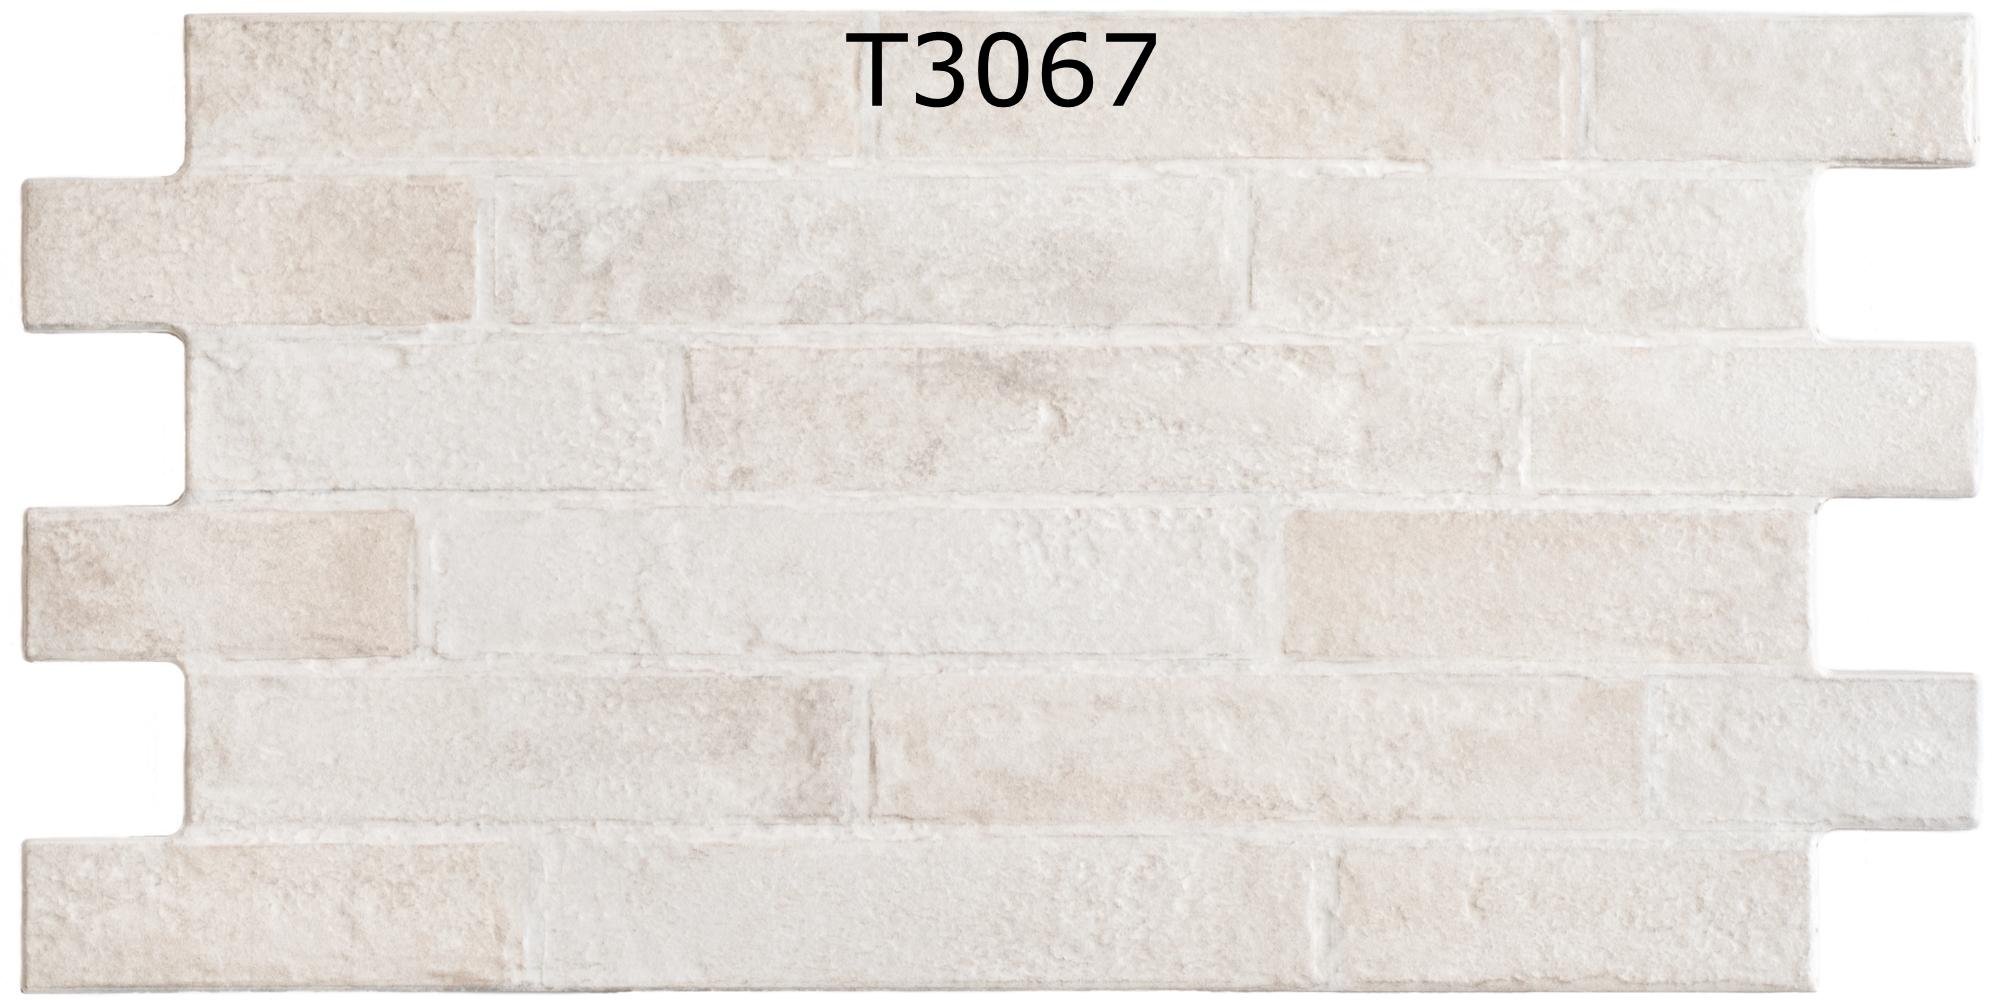 T3067